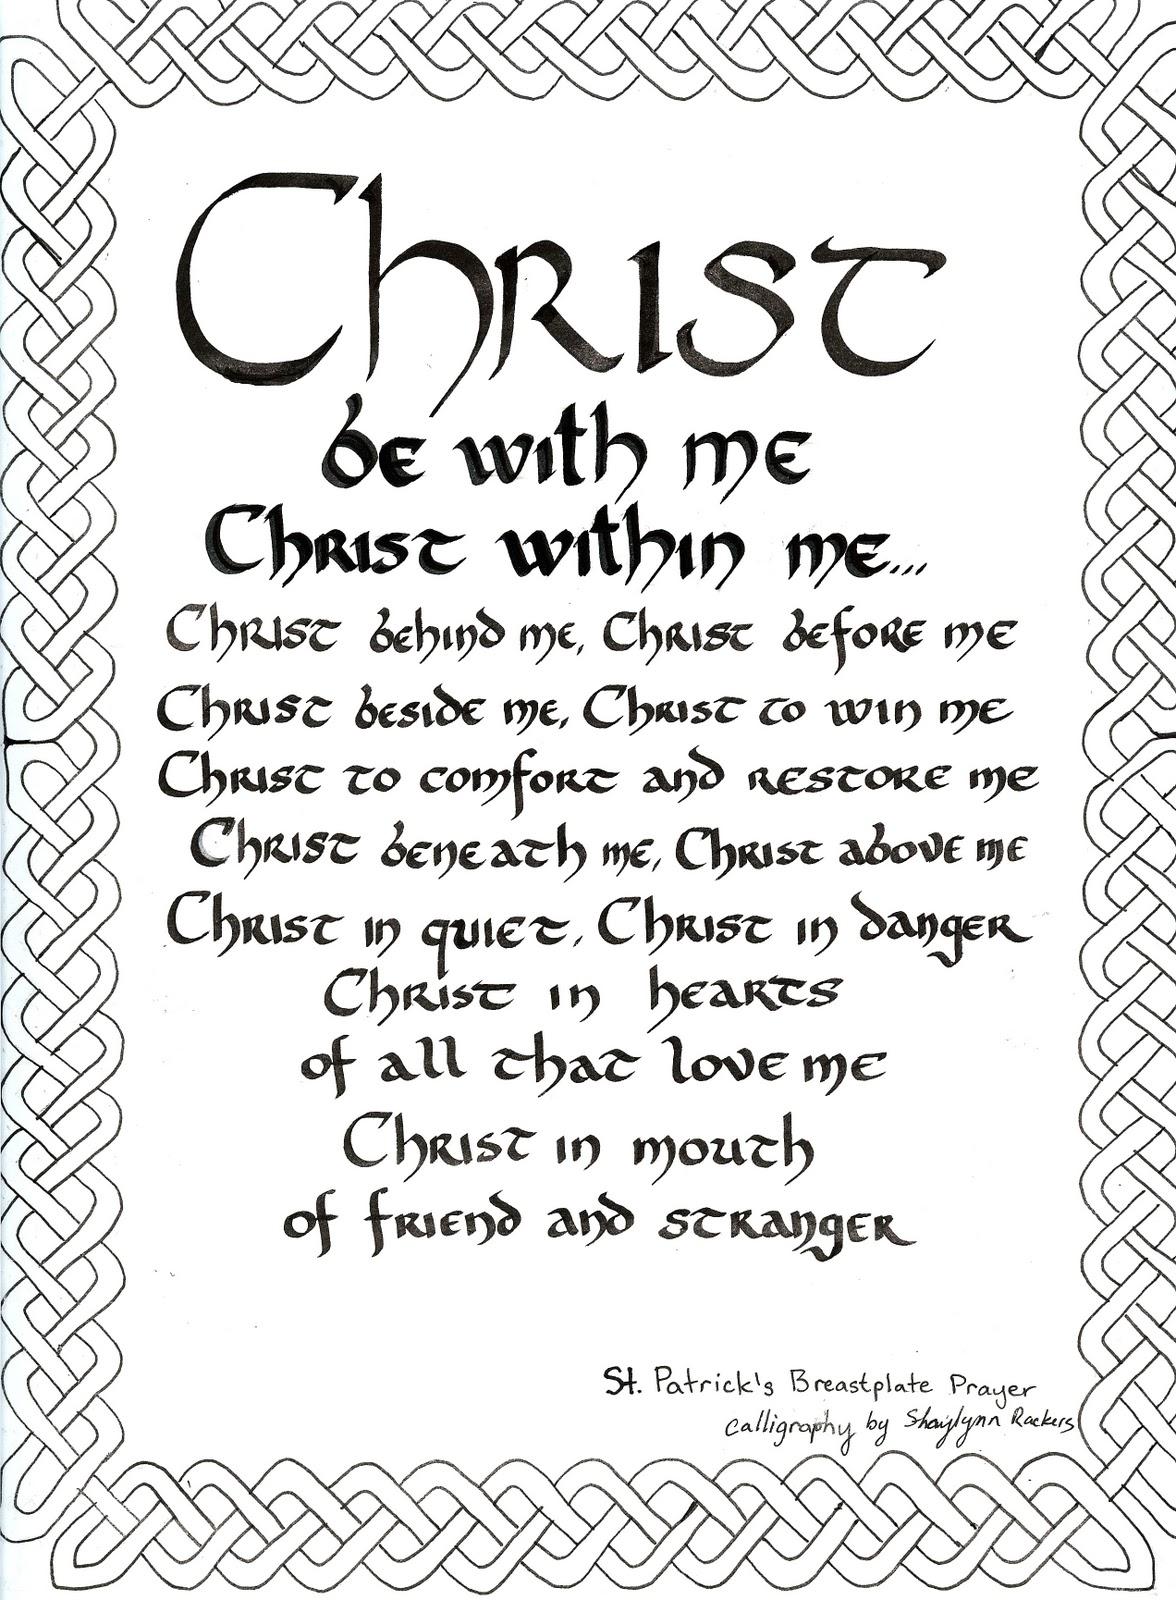 st  patrick u0026 39 s prayer  celtic knotwork